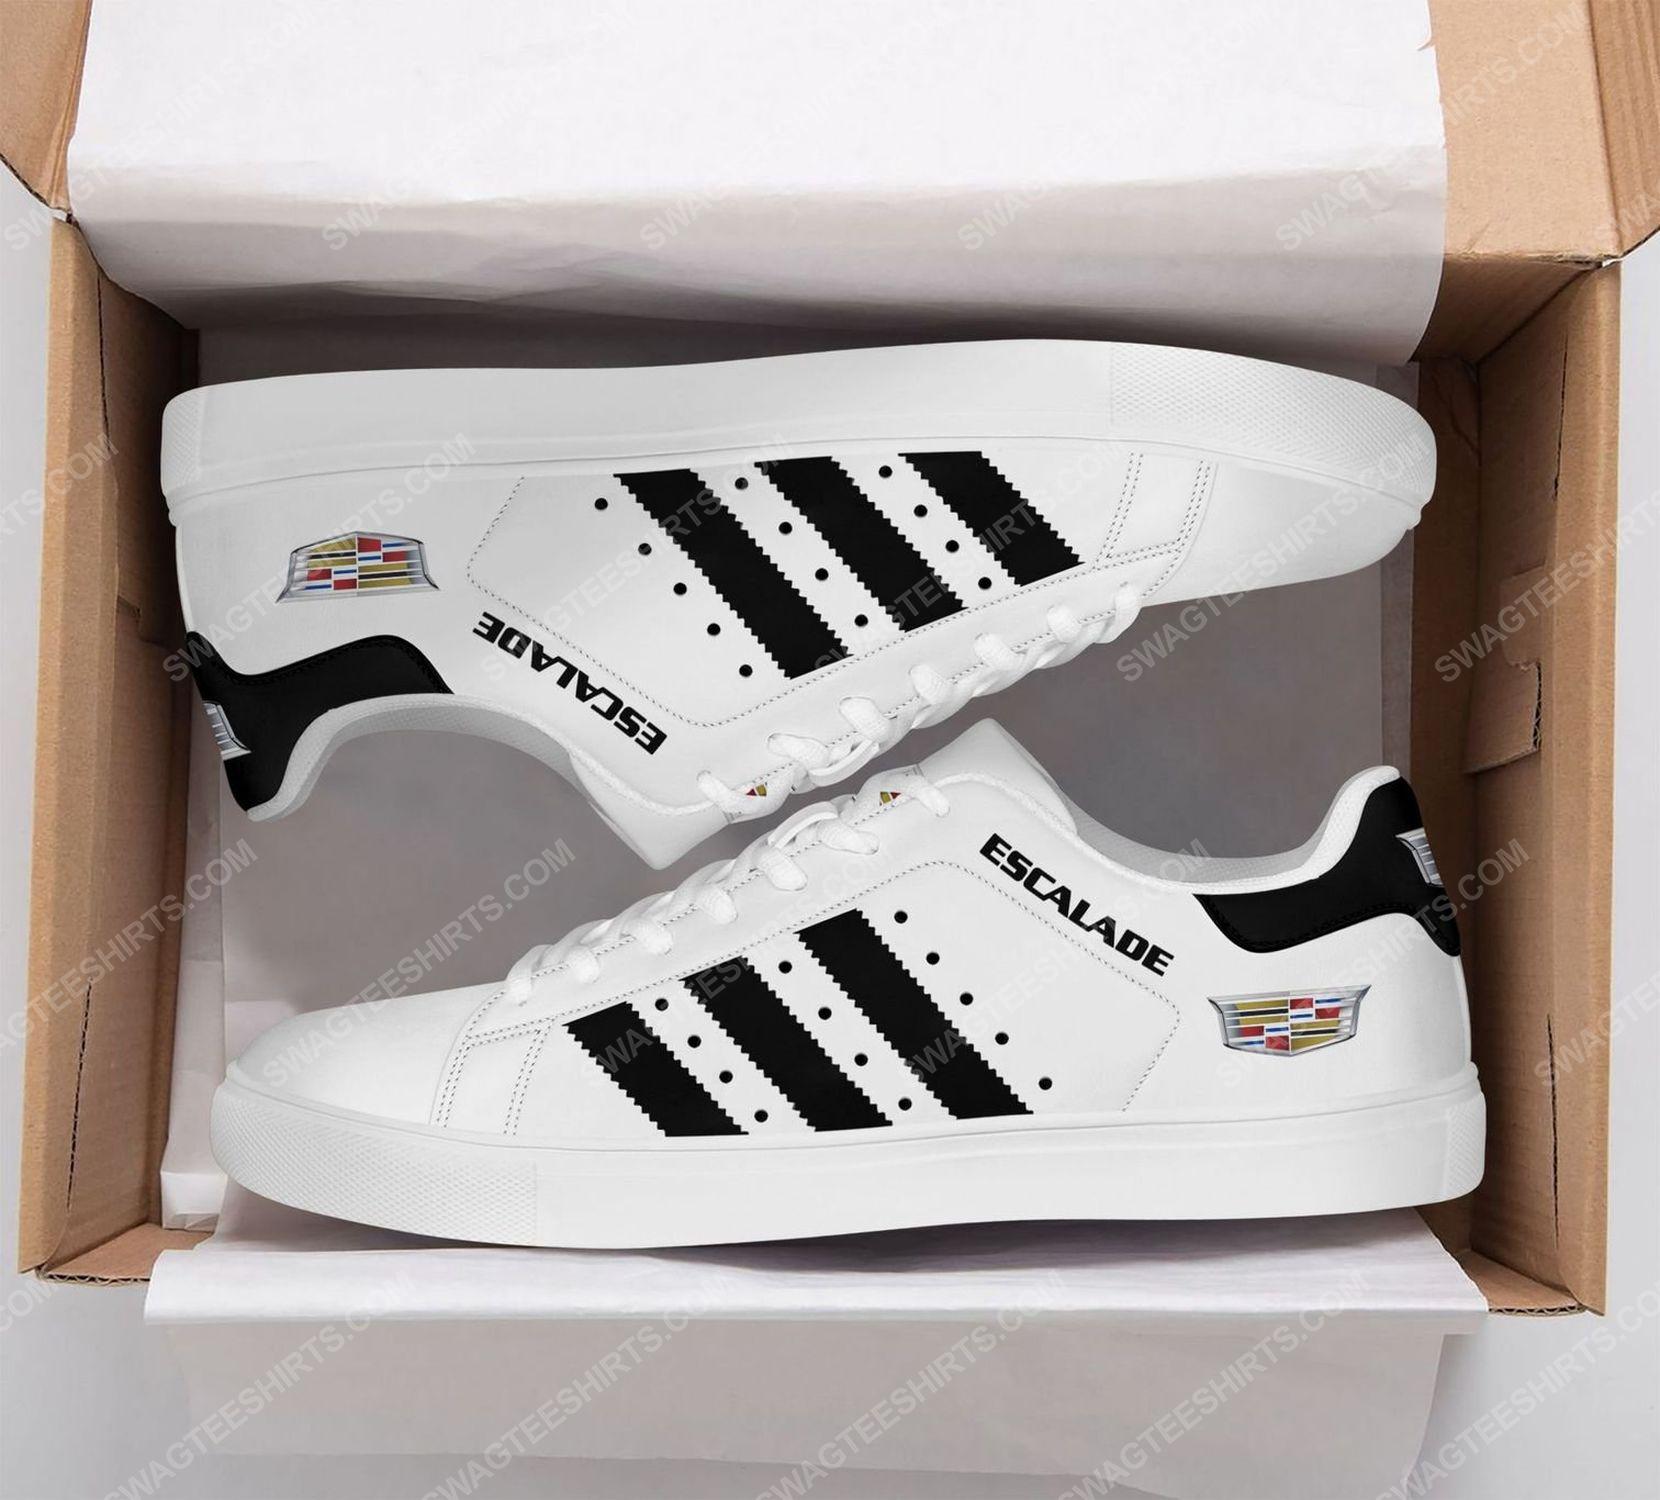 Cadillac escalade version stripe black stan smith shoes 2